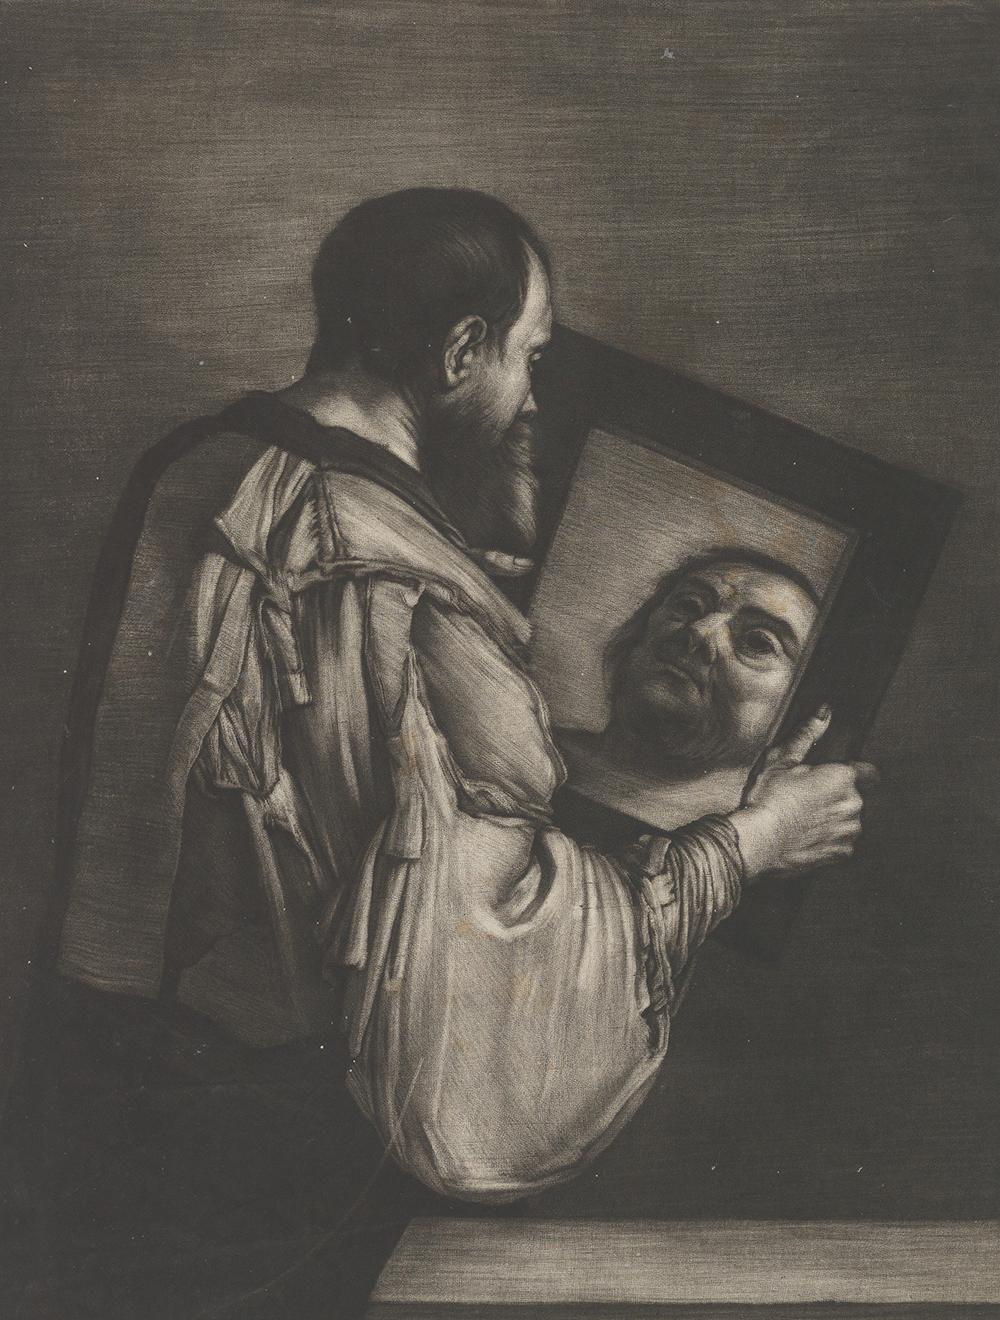 """Socrates Looking in a Mirror,"" by Bernard Vaillant, c. 1650. The Metropolitan Museum of Art, A. Hyatt Mayor Purchase Fund, Marjorie Phelps Starr Bequest, 1982."